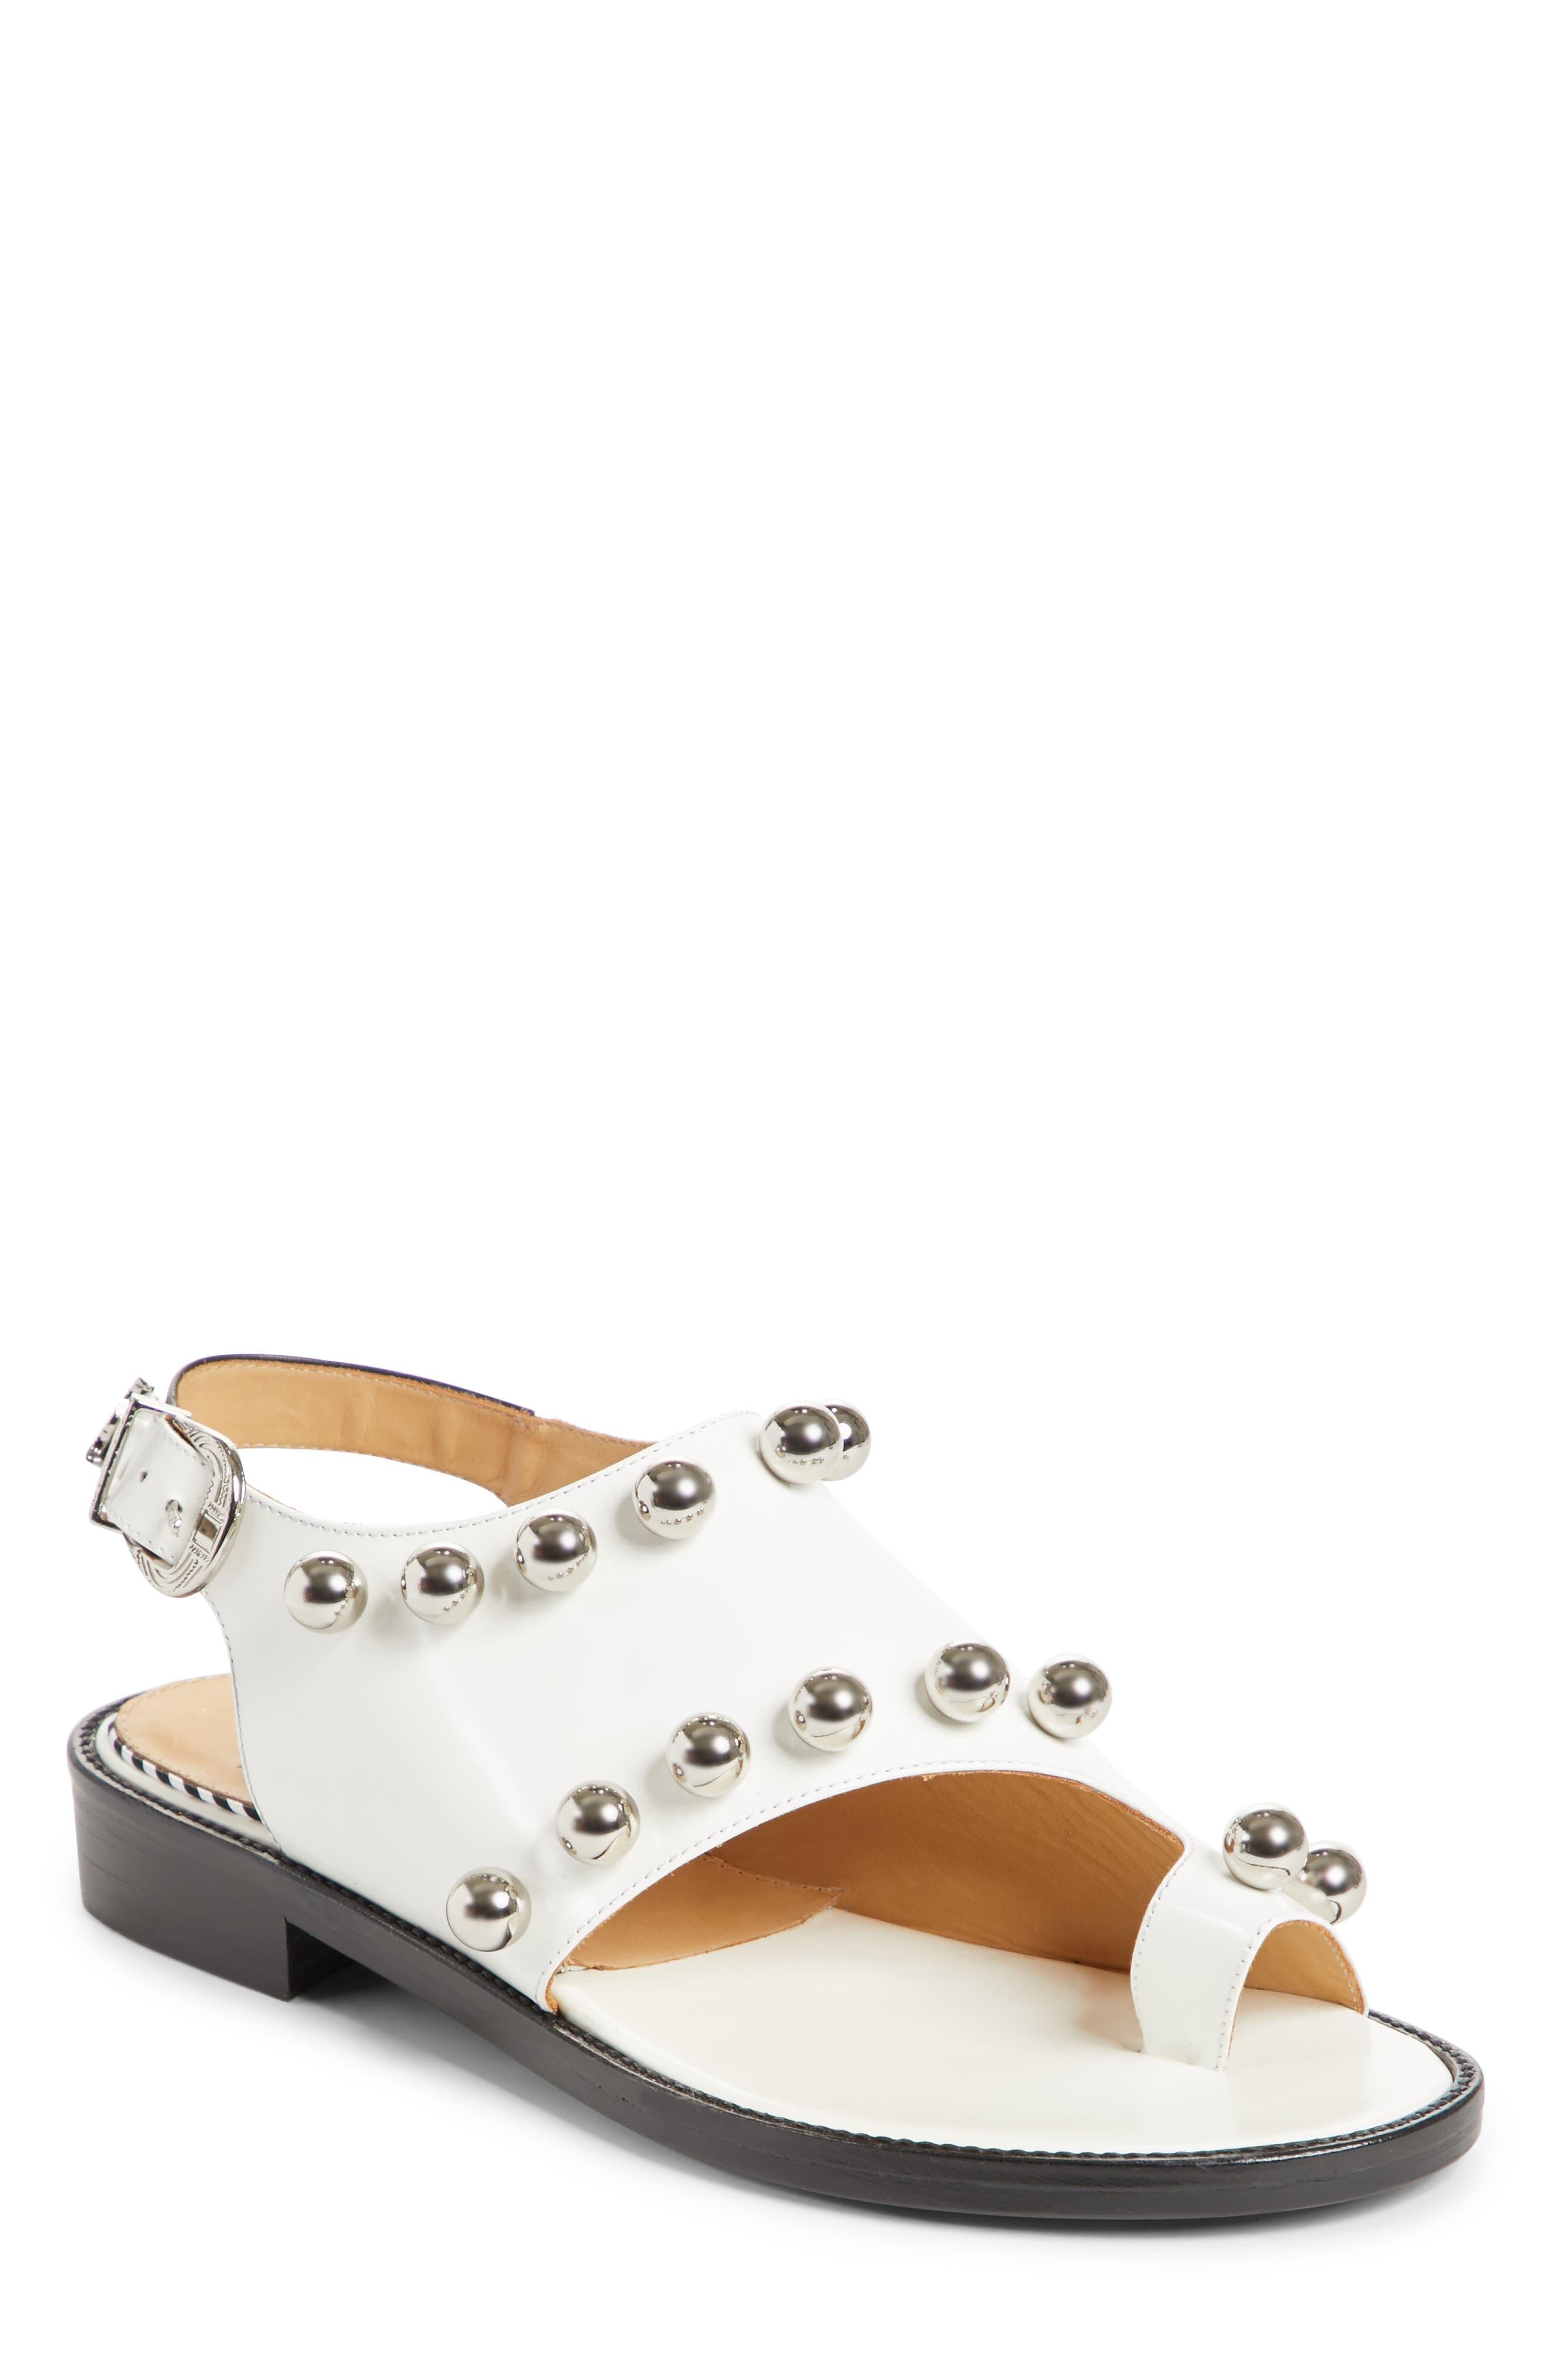 Alternate Image 1 Selected - TOGA PULLA Round Stud Sandal (Women)